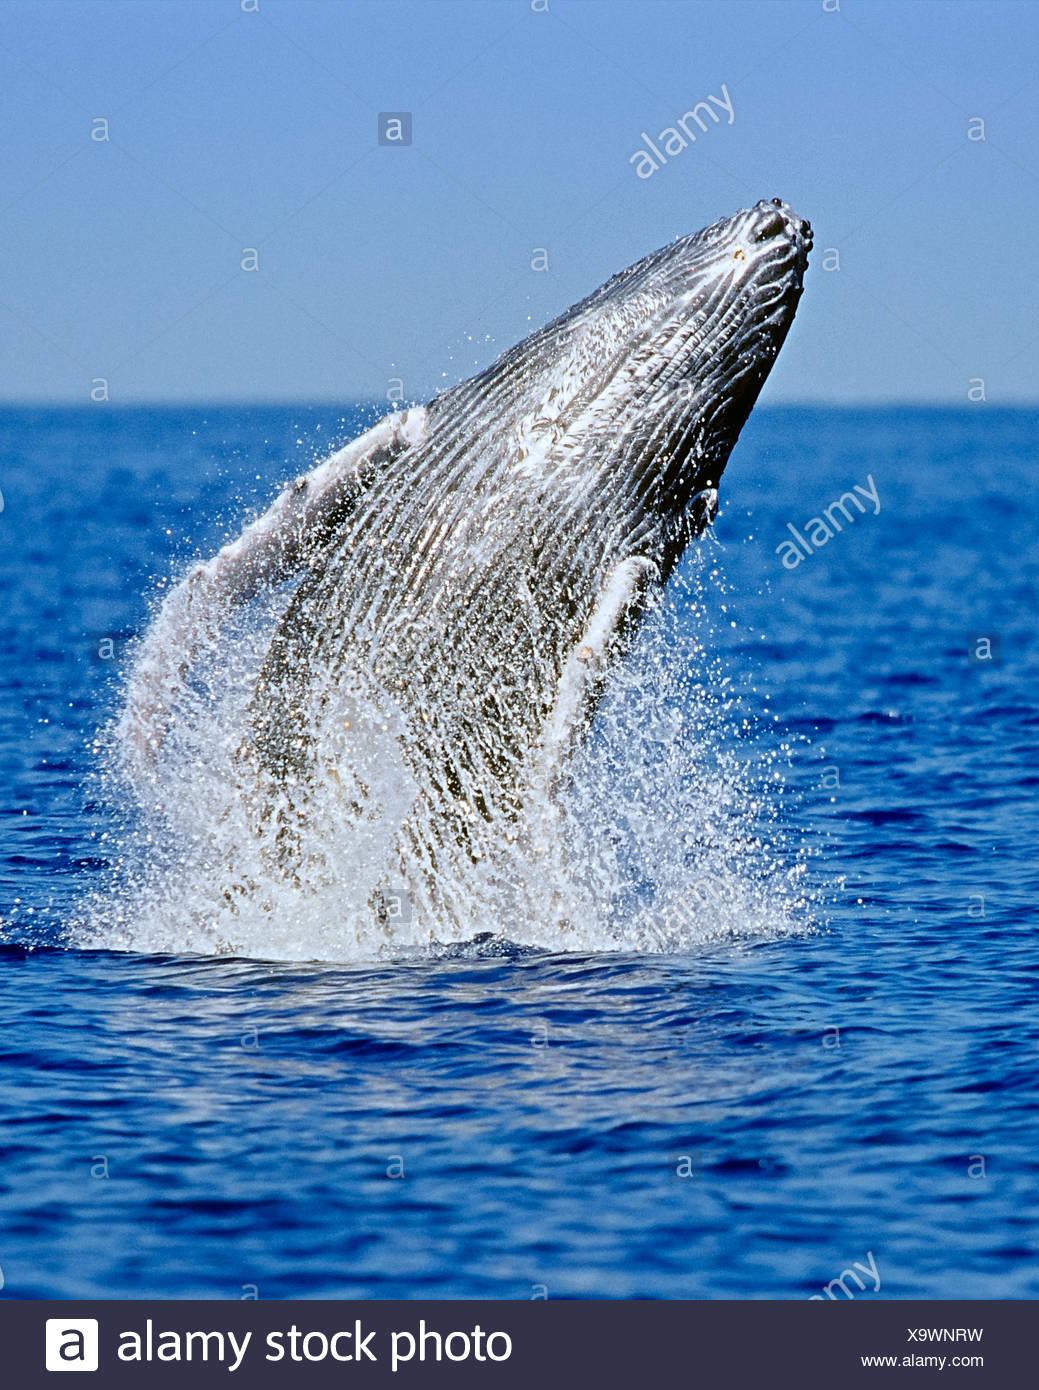 Humpback Whale breaching, Megaptera novaeangliae, Hawaii, USA - Stock Image